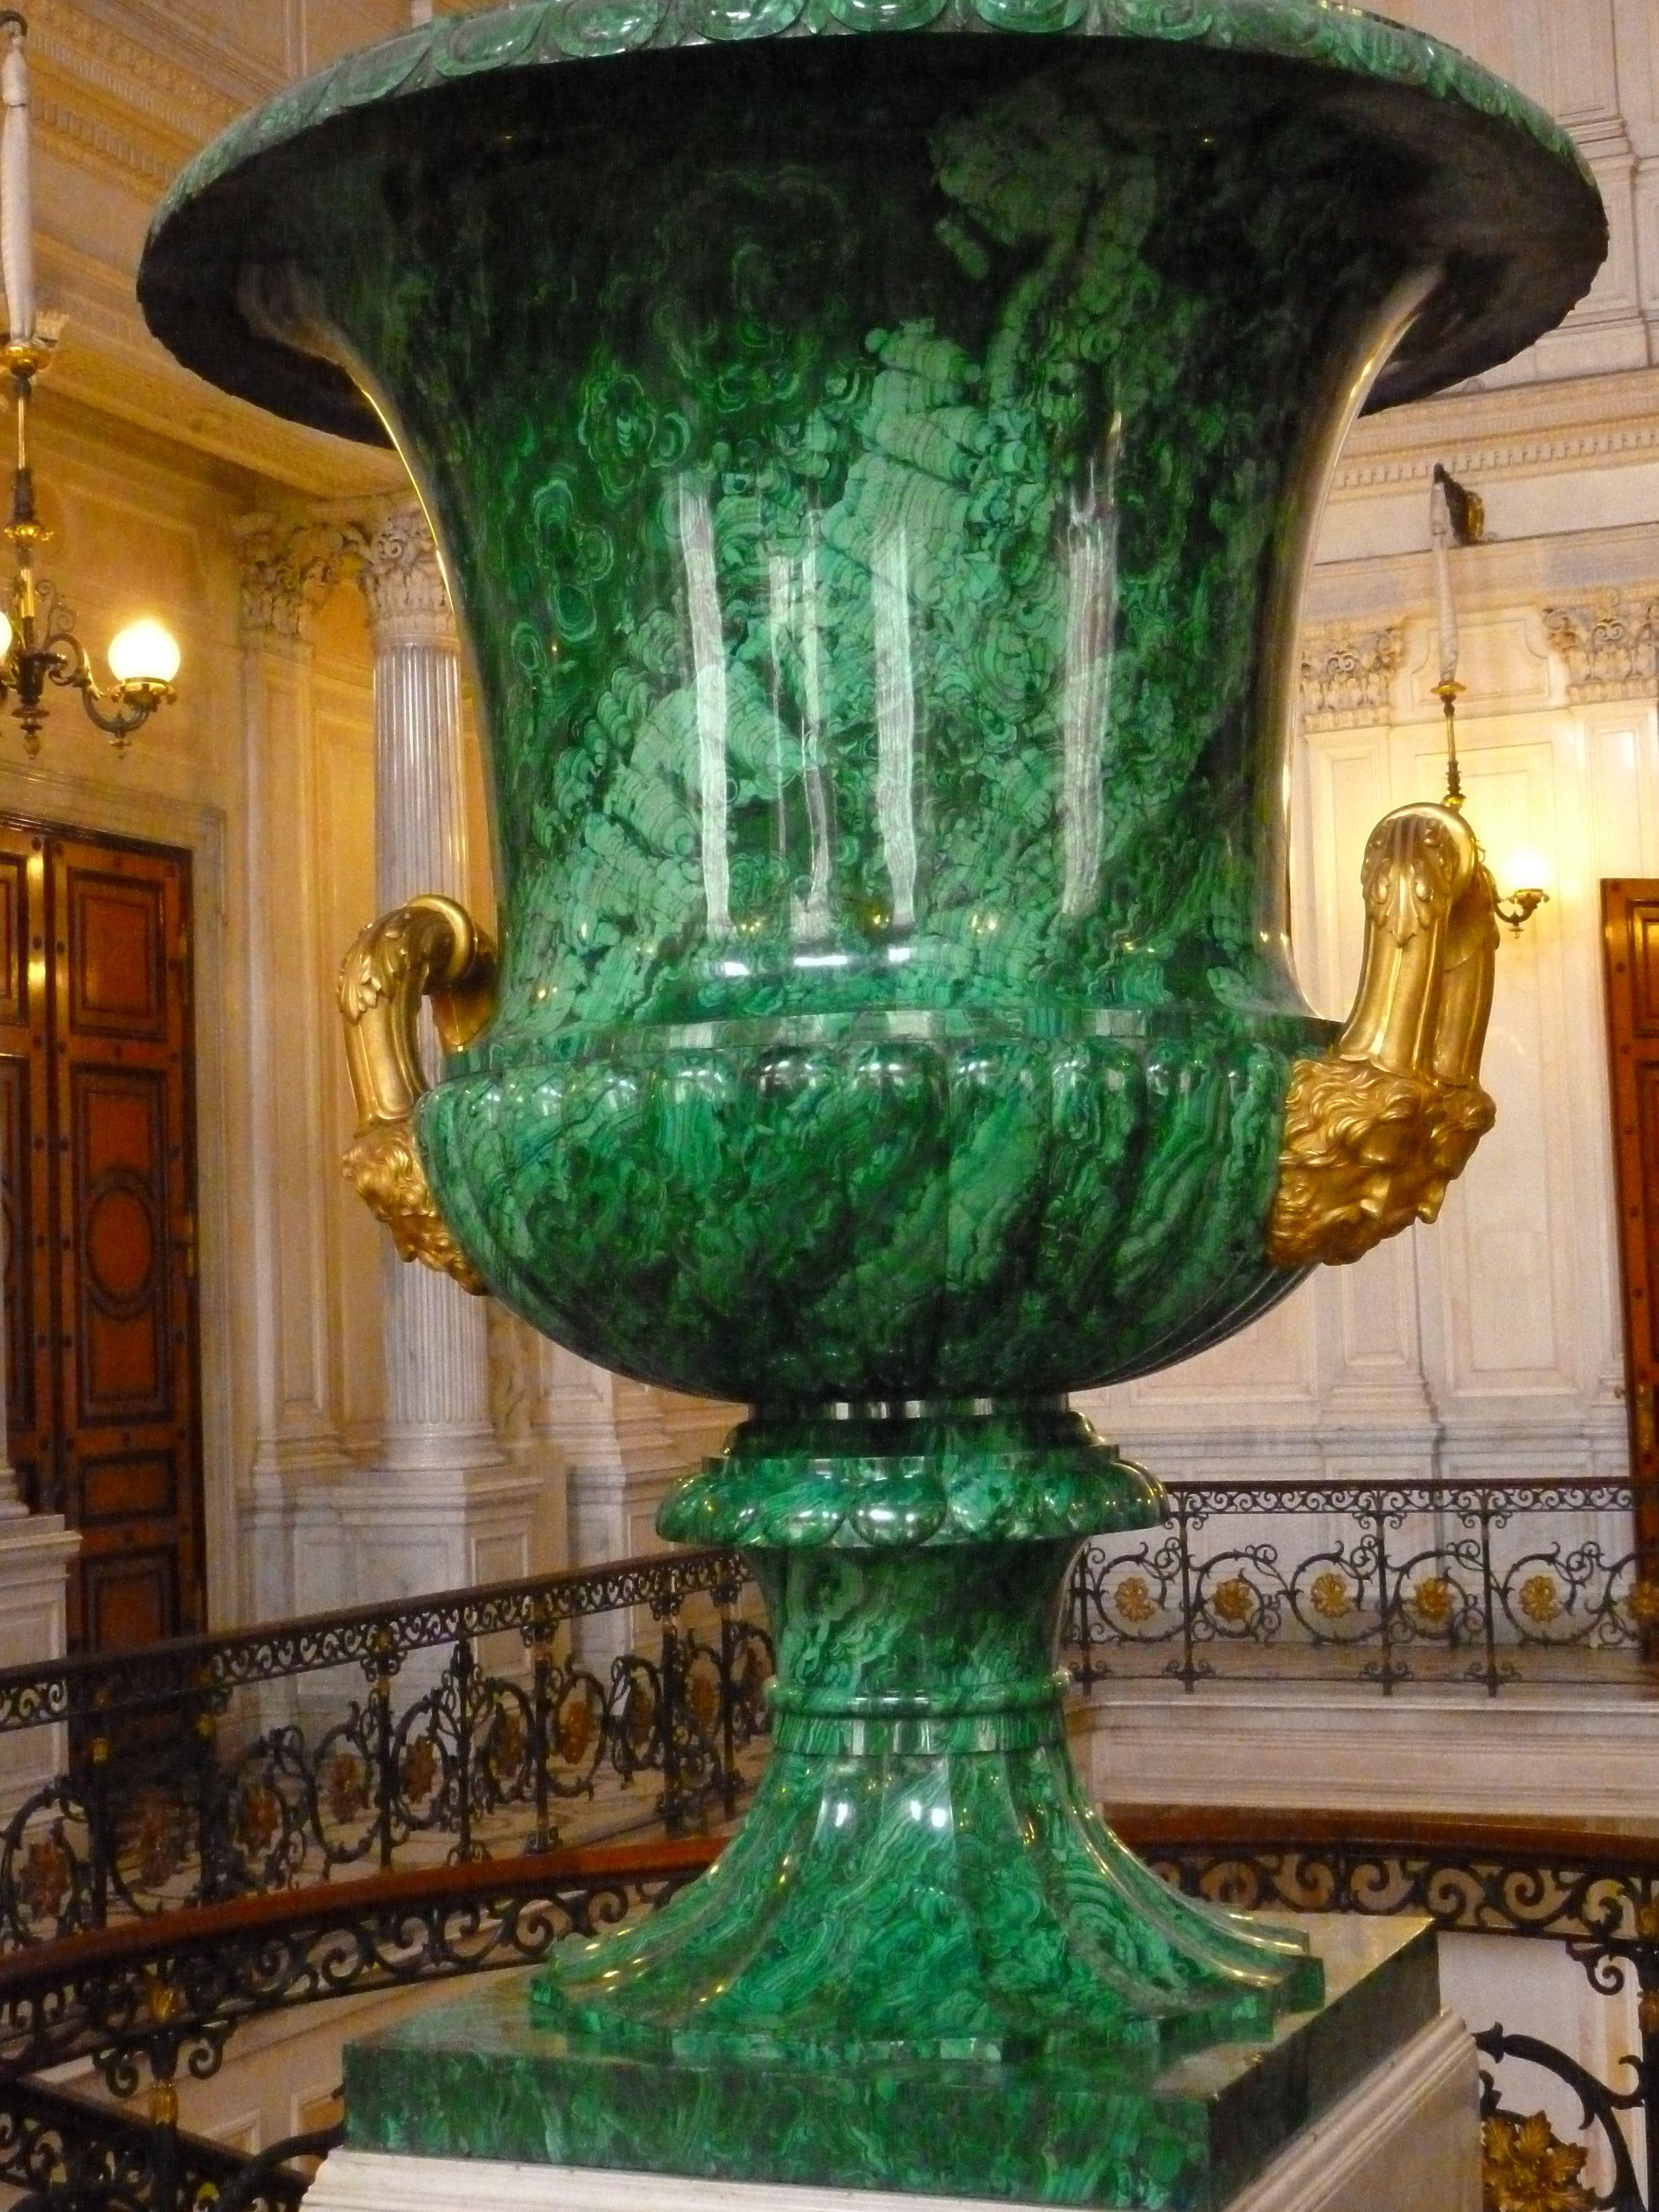 12 Malachite Urn Hermitage Museum Russia Malachite